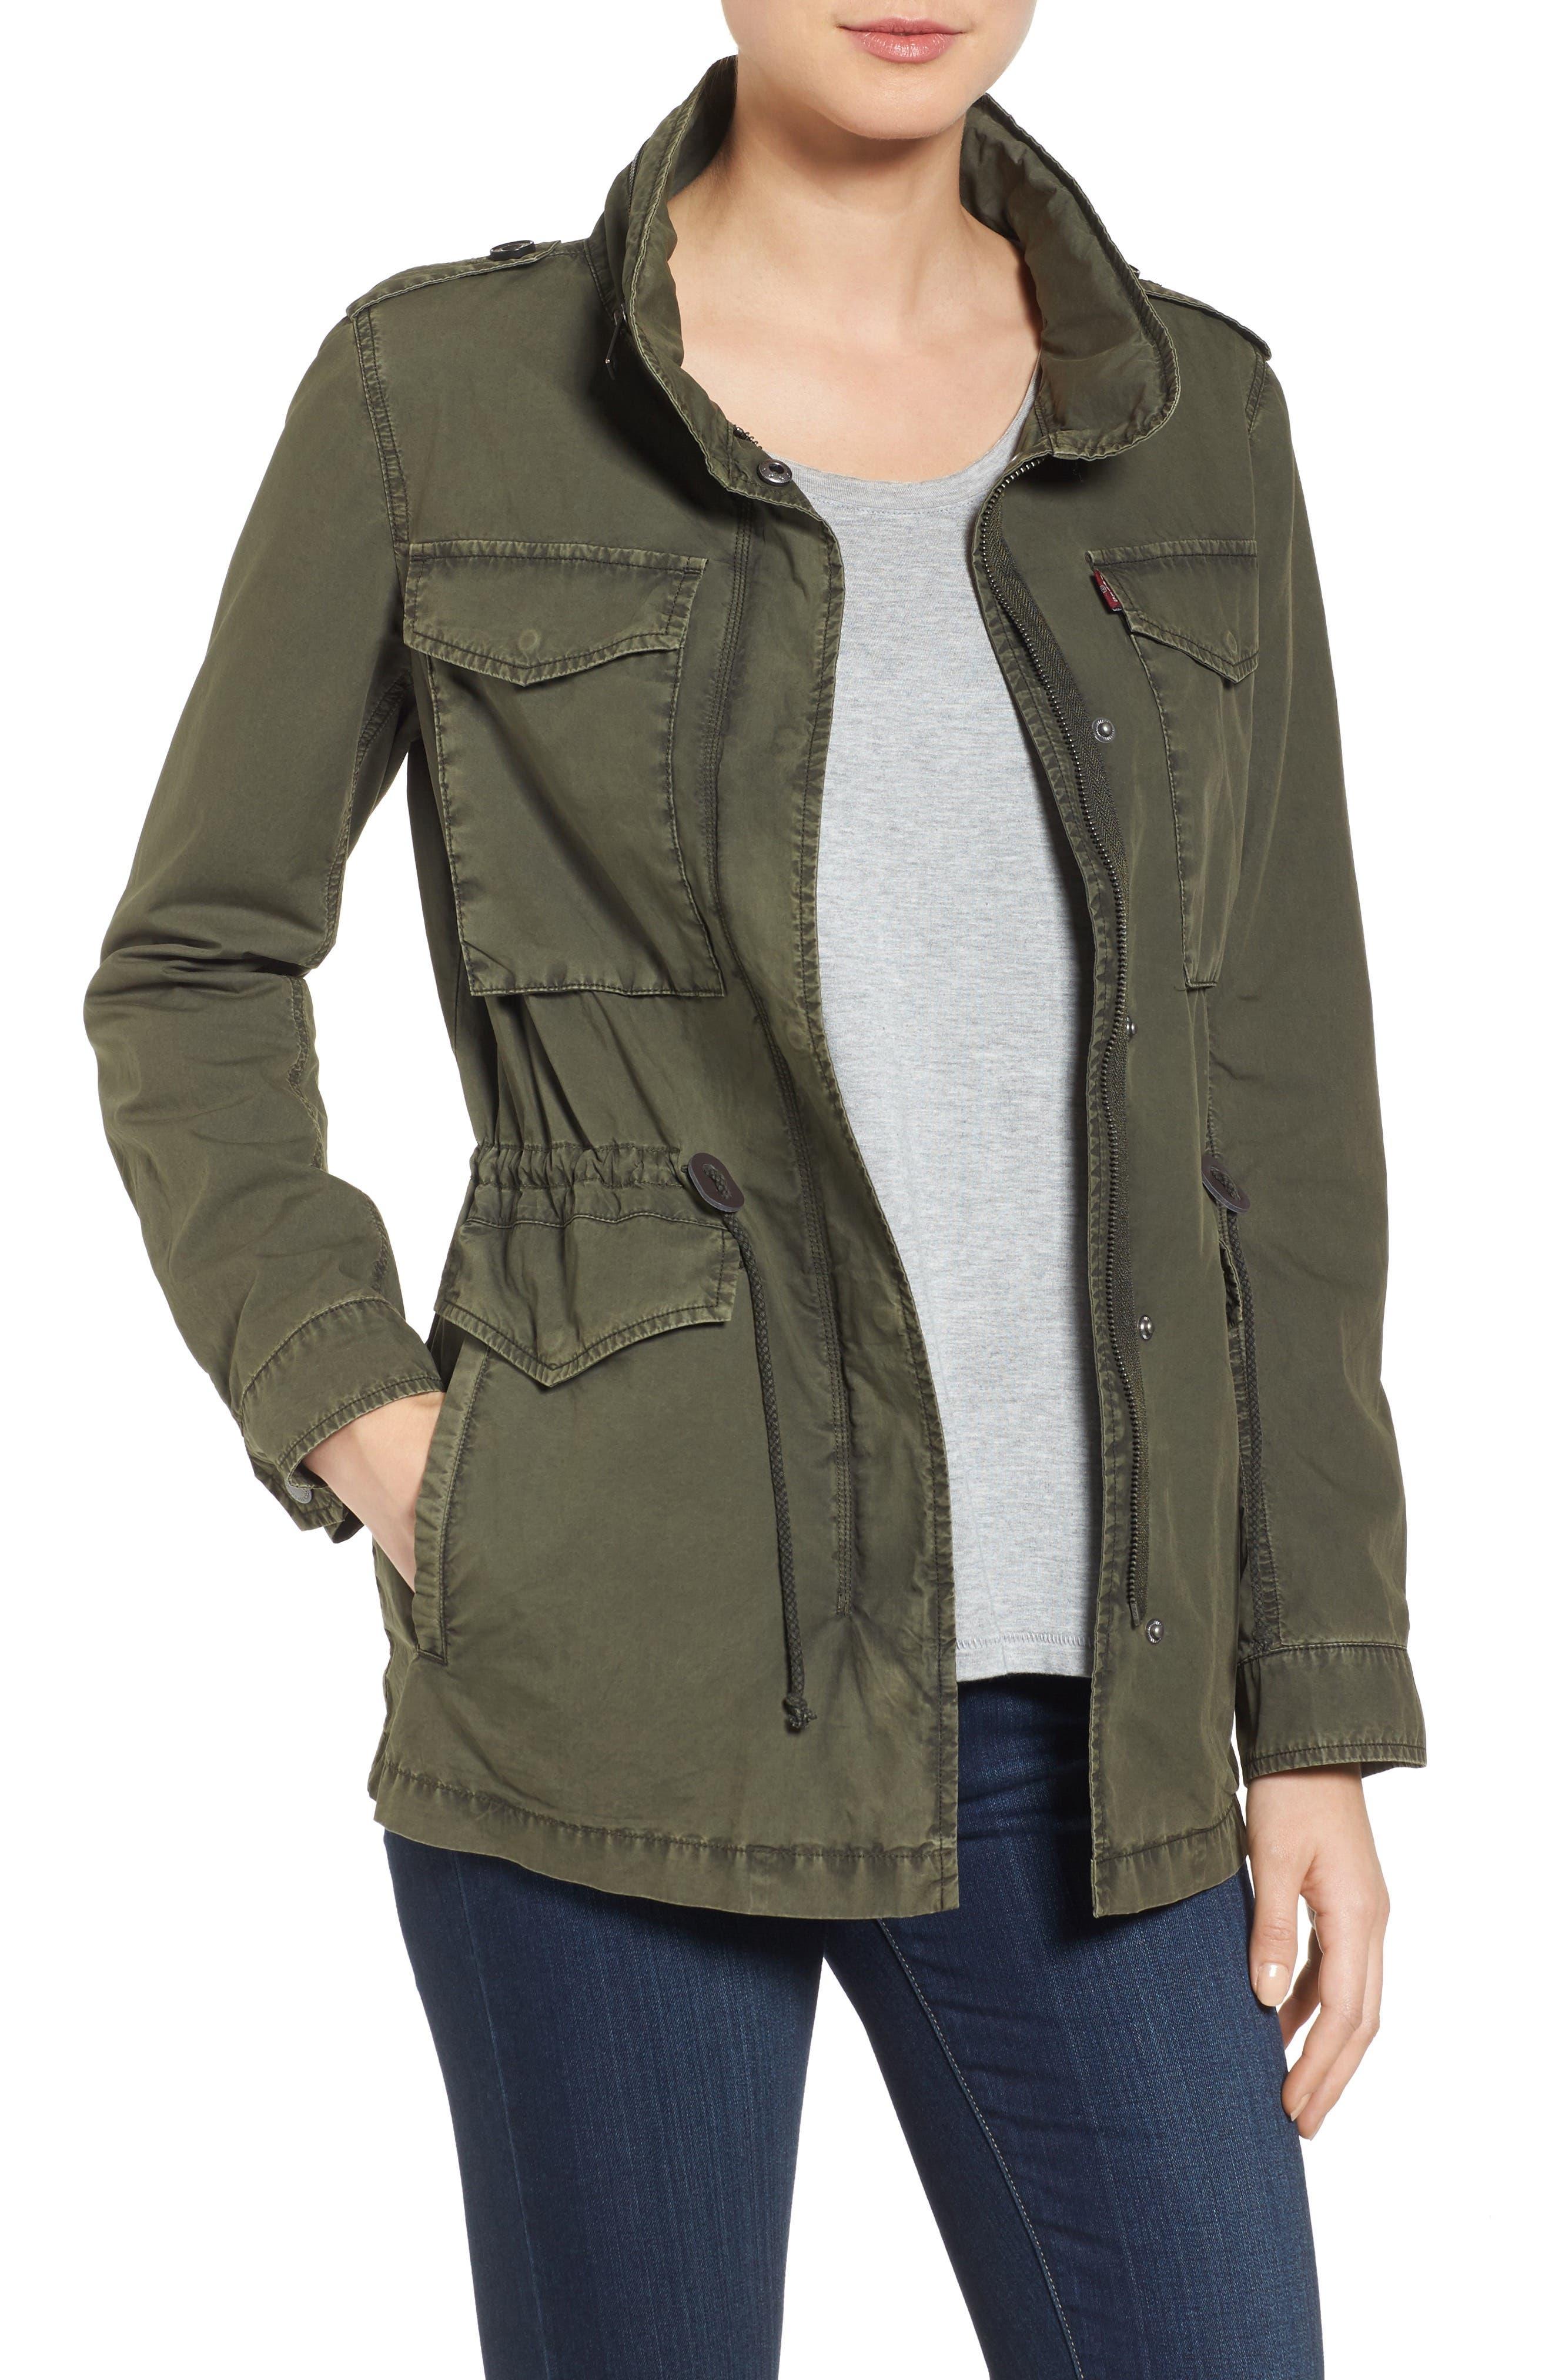 Nike jacket army - Nike Jacket Army 55